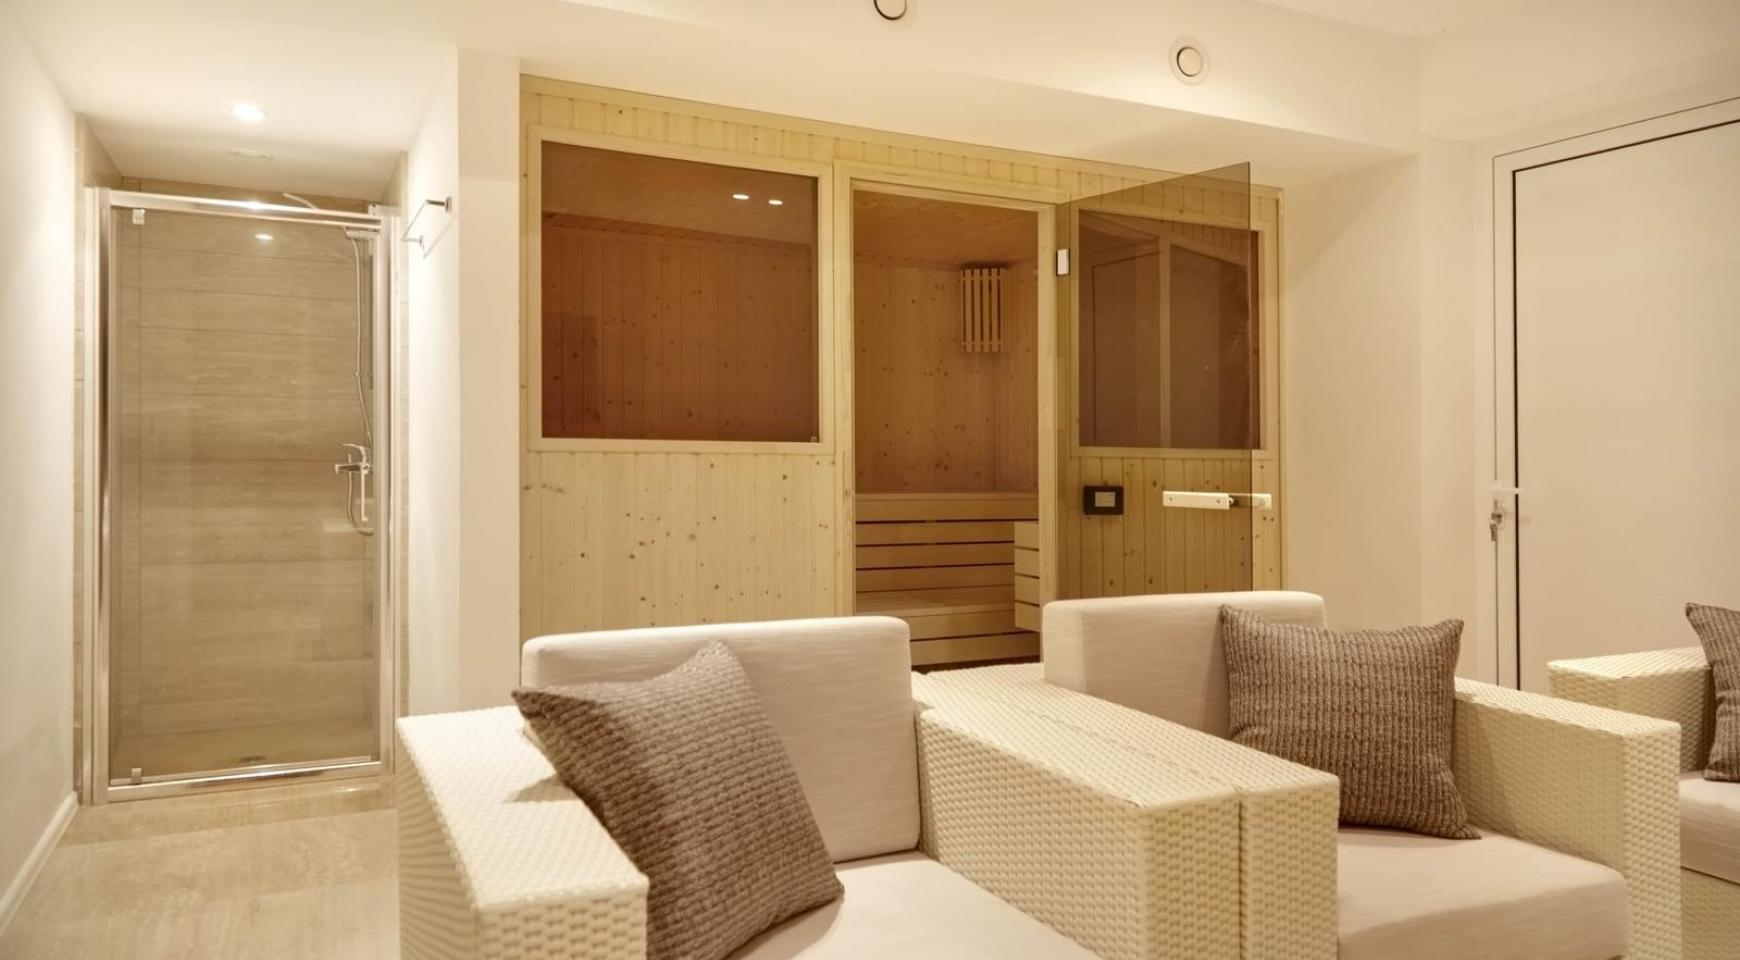 New Luxurious 4 Bedroom Villa in the Tourist Area - 42